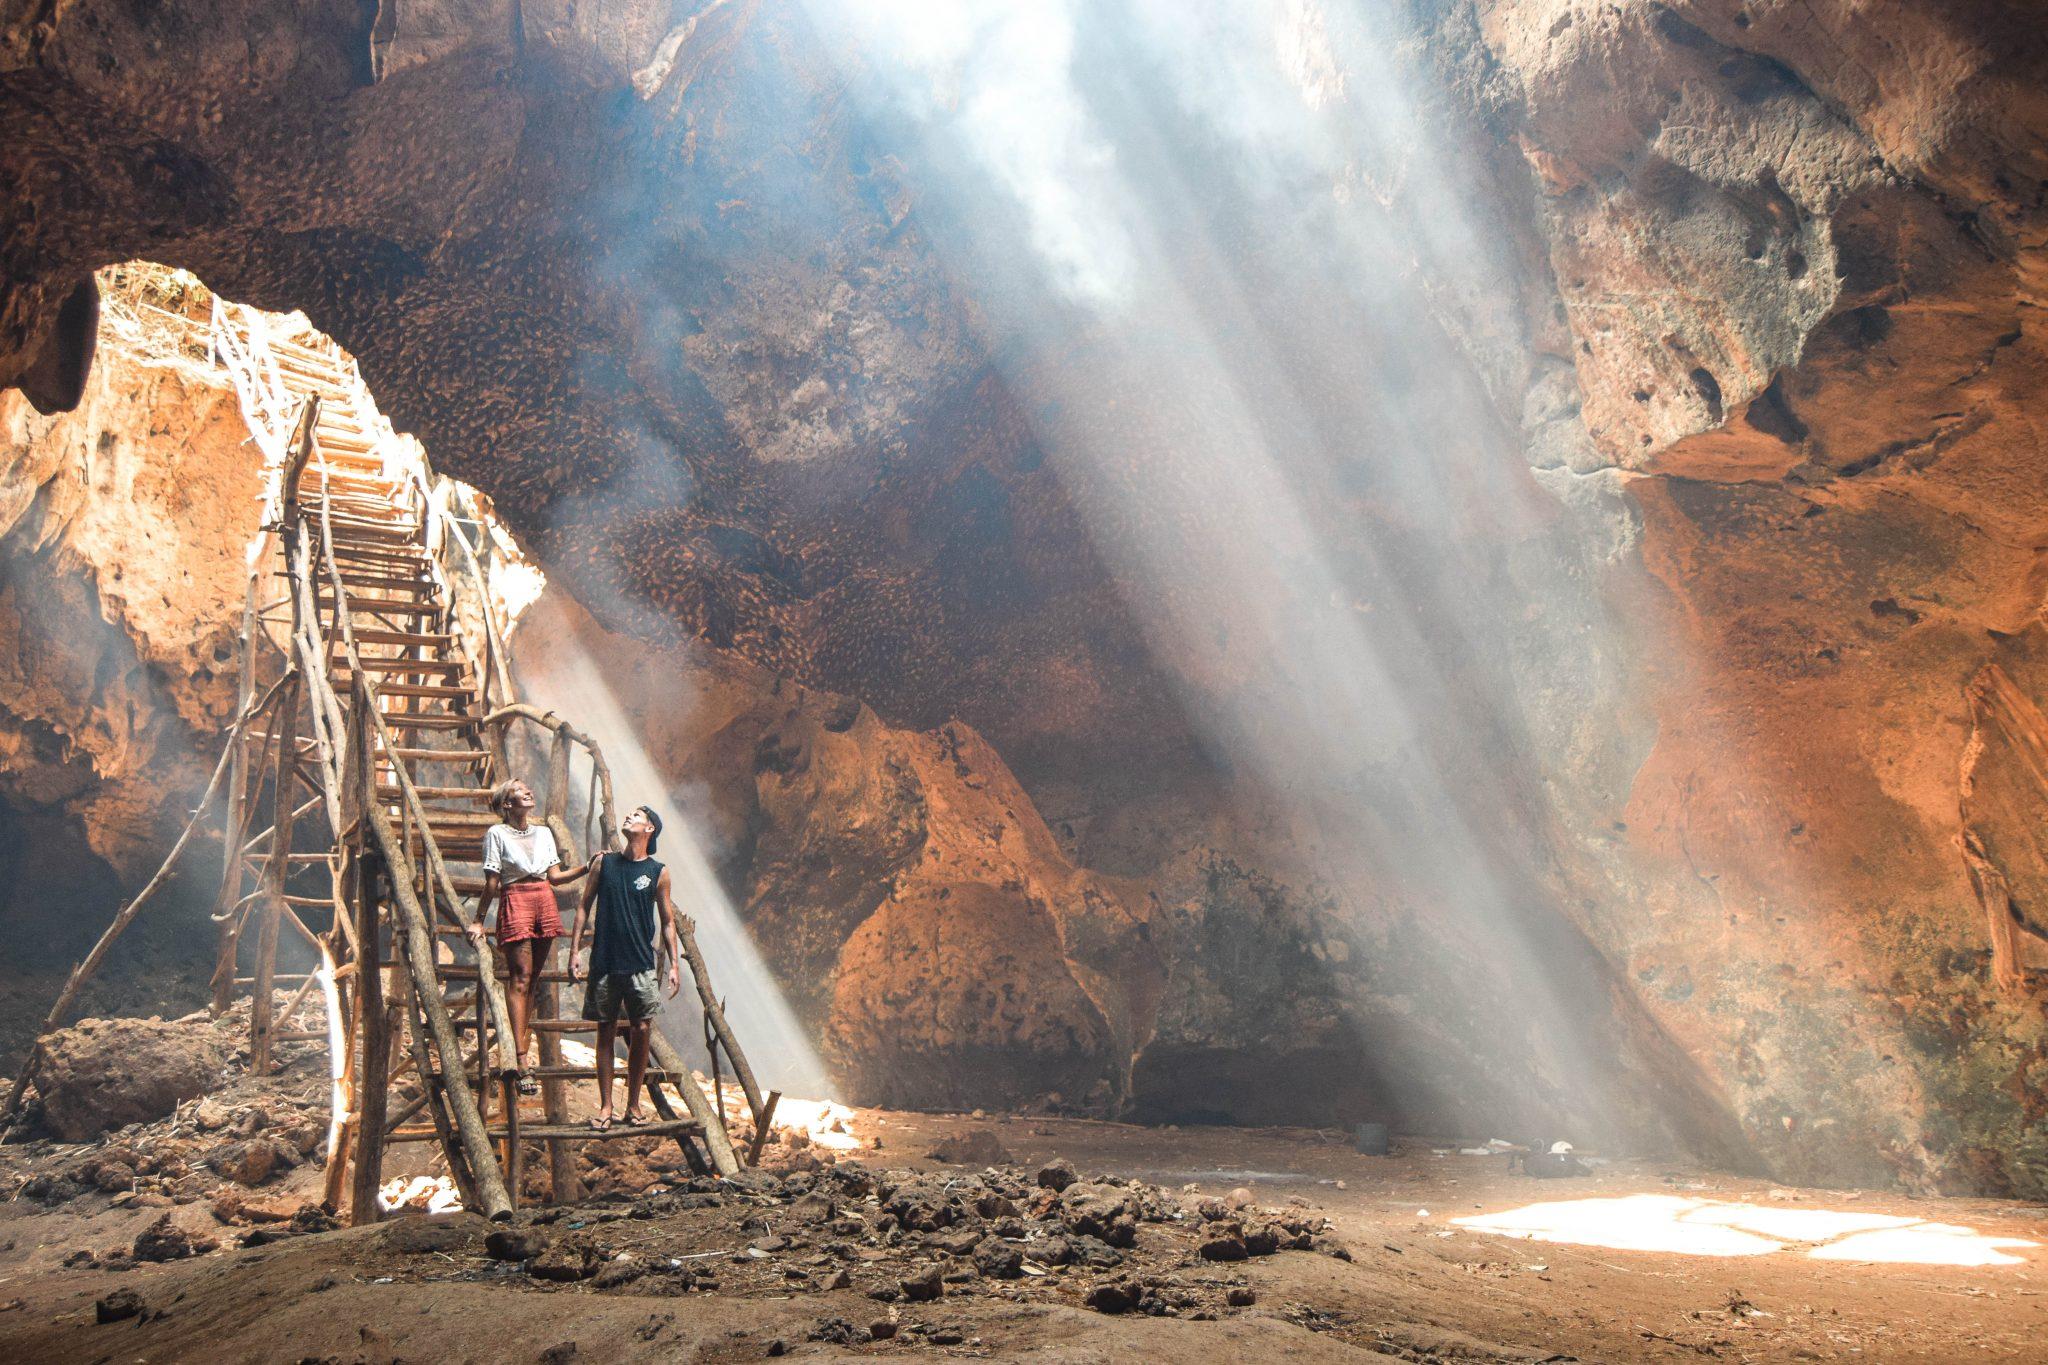 Wanderers & Warriors - Charlie & Lauren UK Travel Couple - Bangkang Cave Lombok Bat Cave Lombok Bat Cave Things To Do In Kuta Lombok